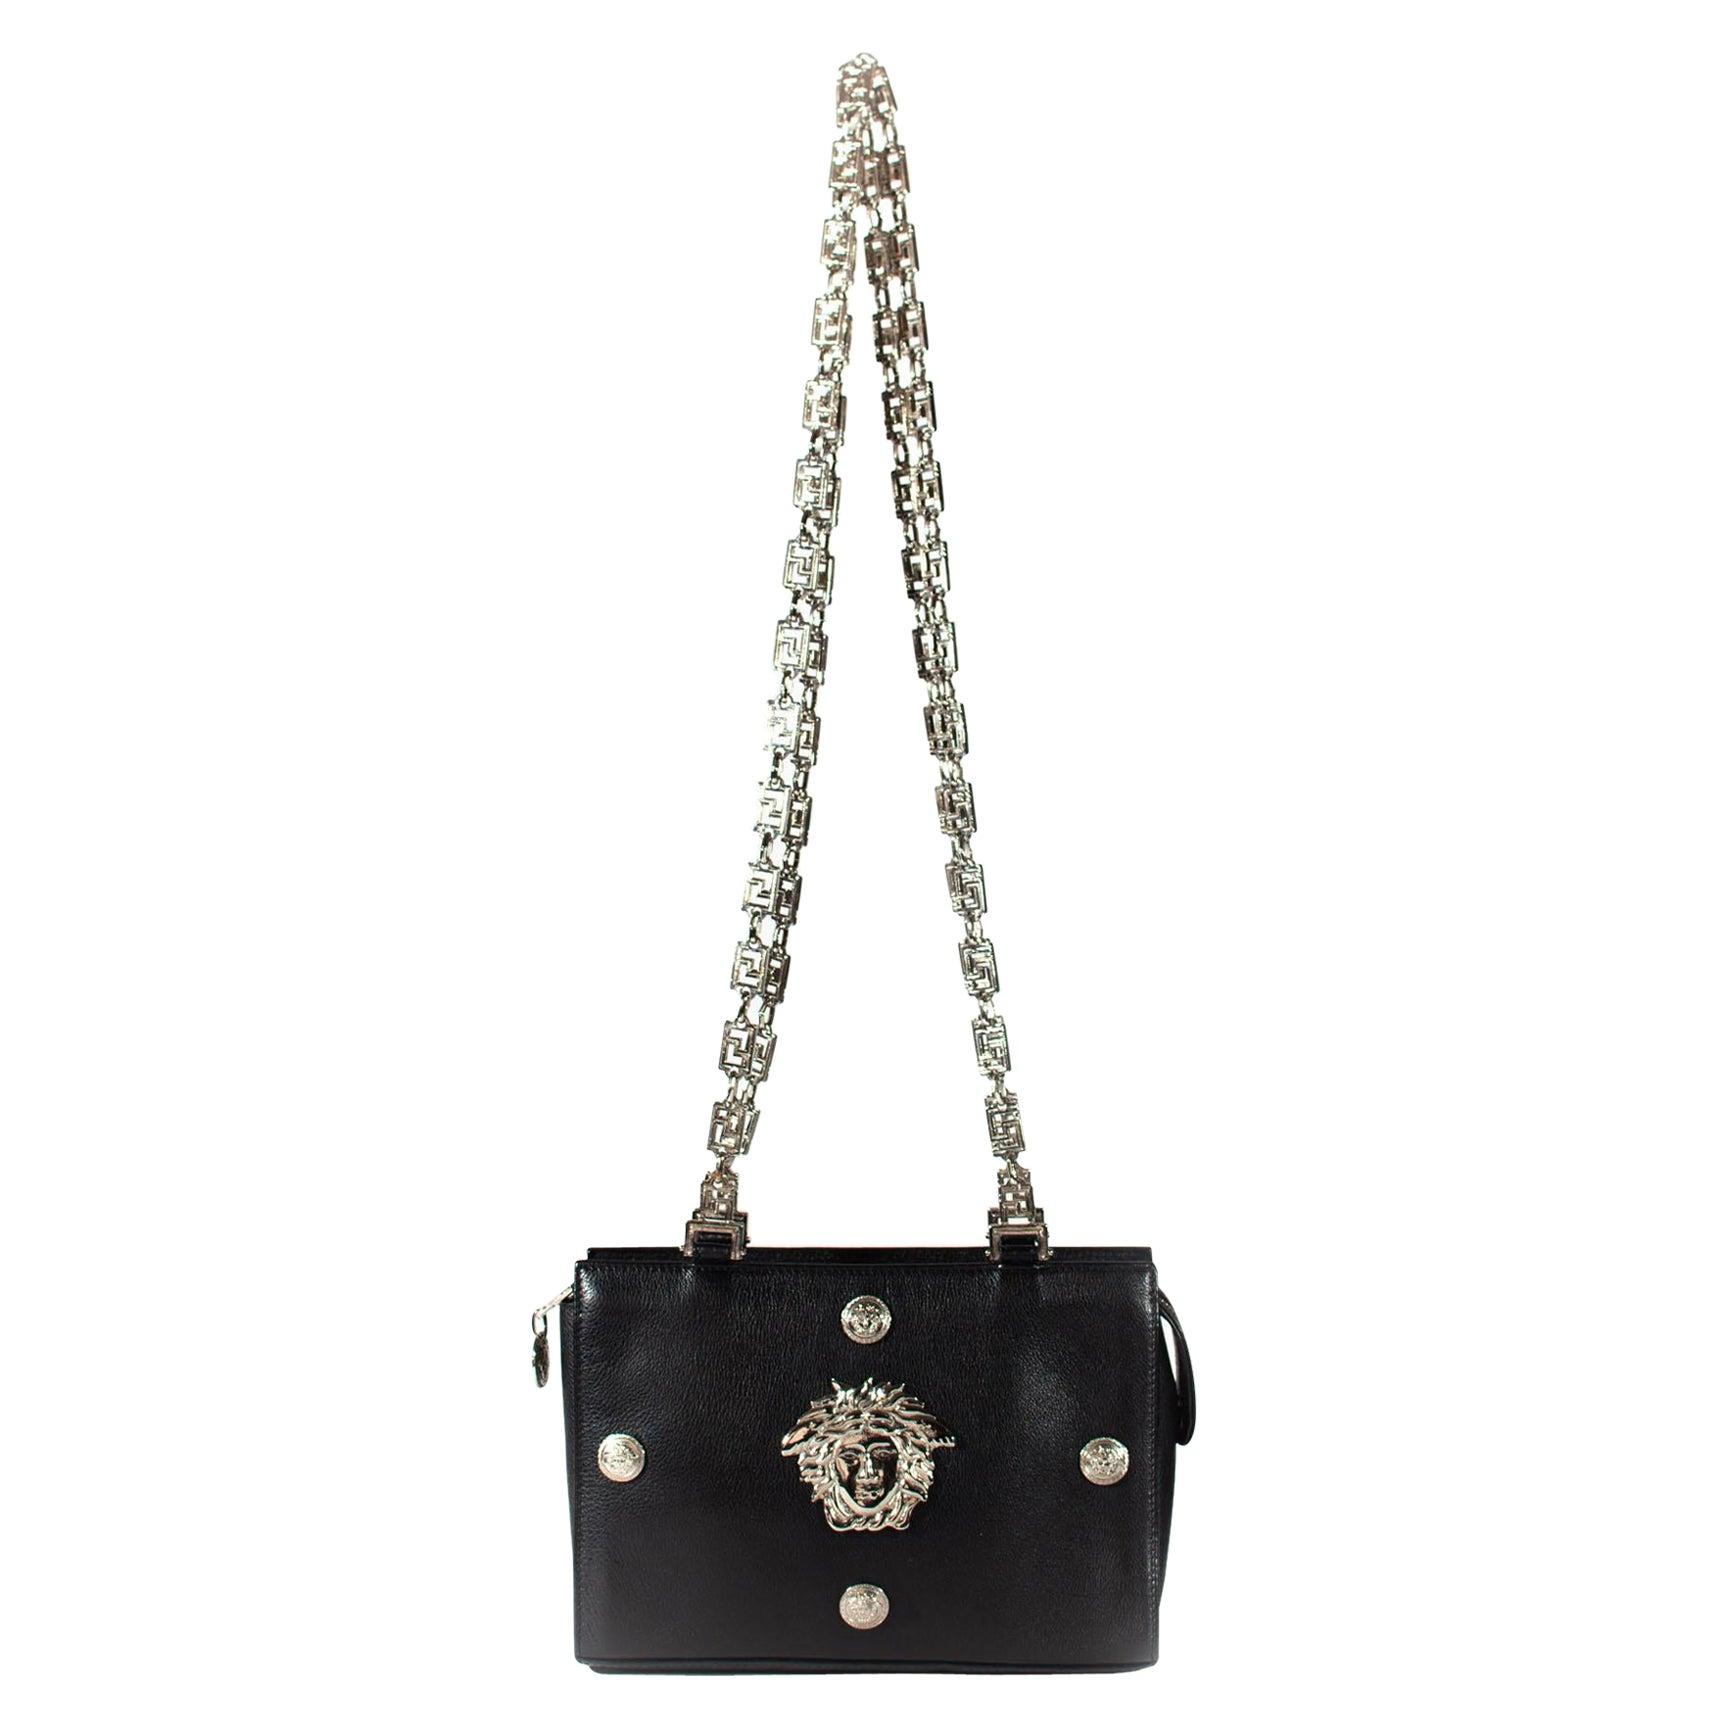 Gianni Versace Couture Silver Greek Key Medusa Leather Shoulder & Crossbody Bag